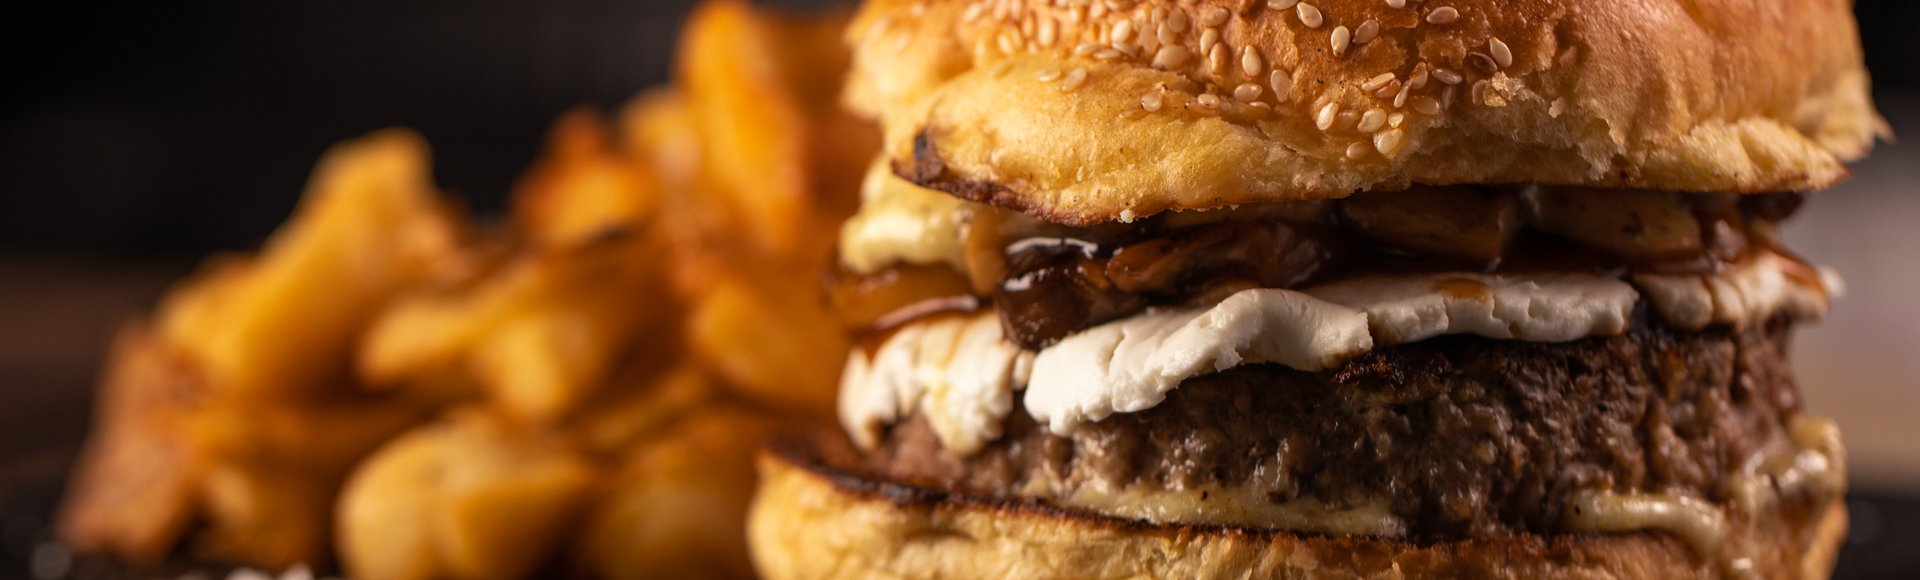 Burger με μανιτάρια